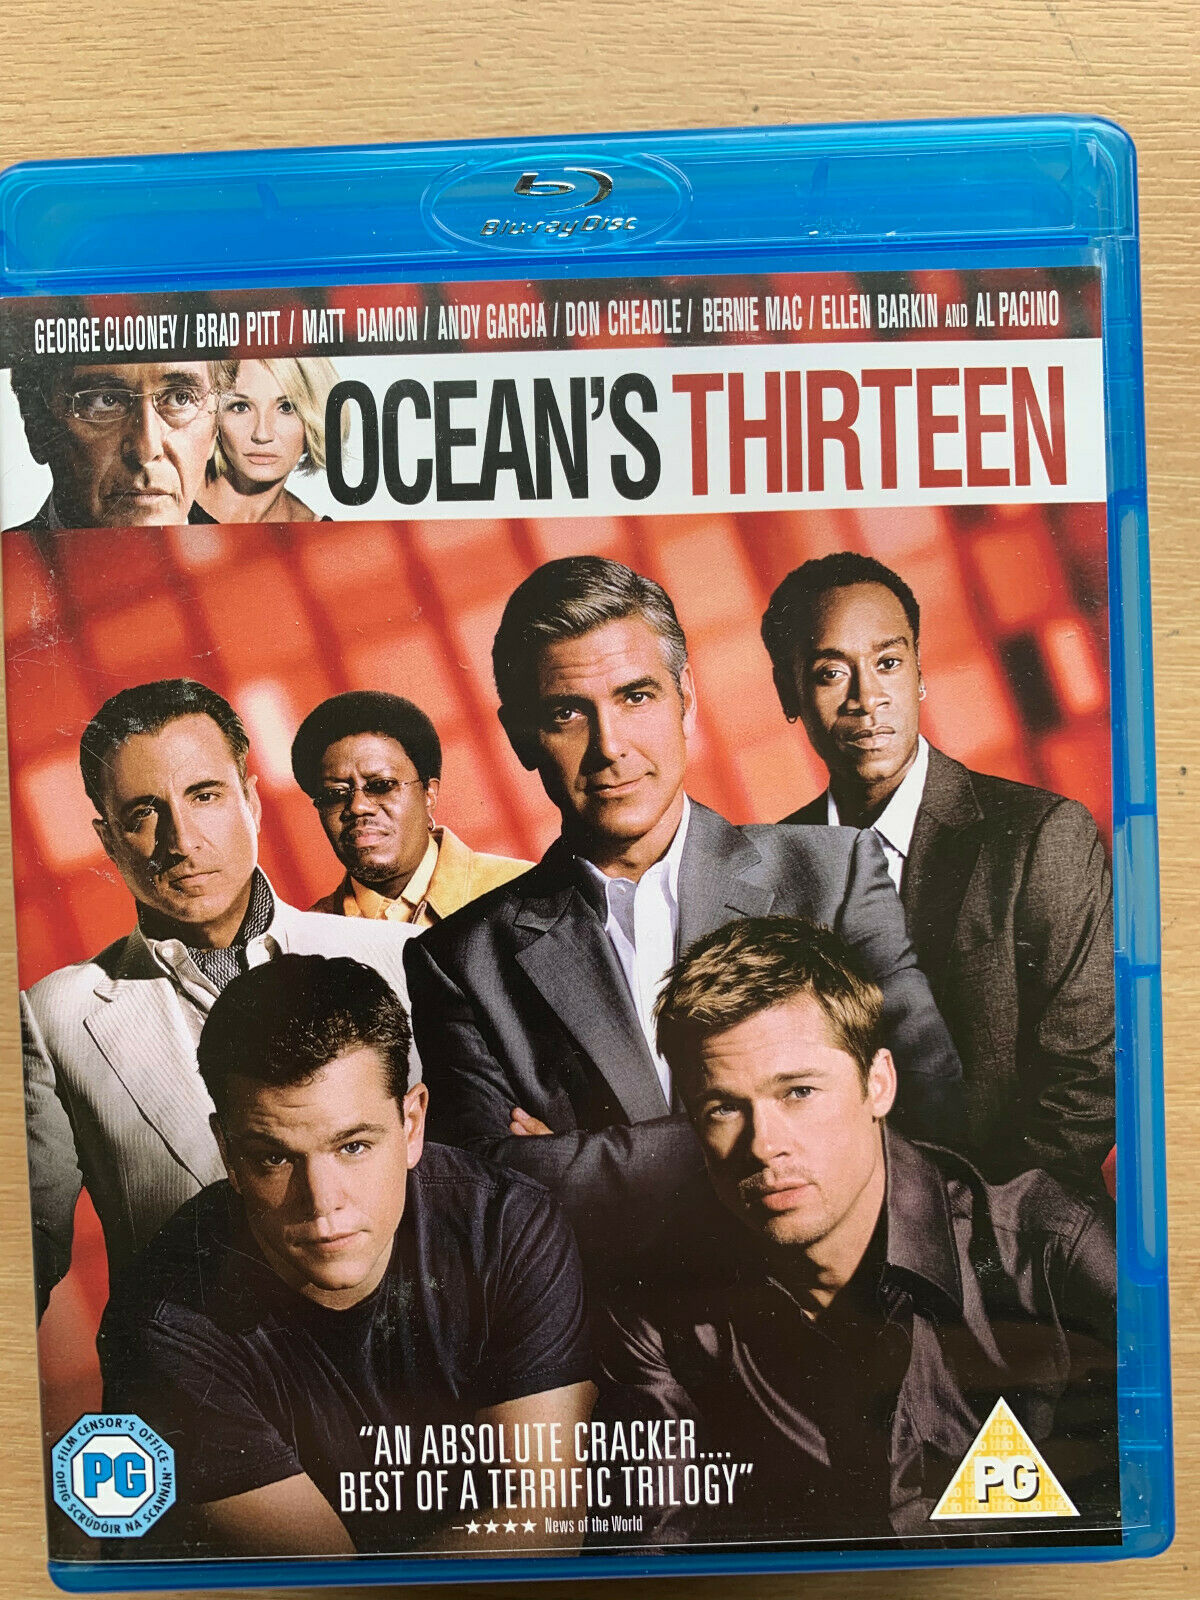 Ocean S Thirteen Blu Ray 2007 Heist Film W George Clooney Brad Pitt Matt Damon For Sale Online